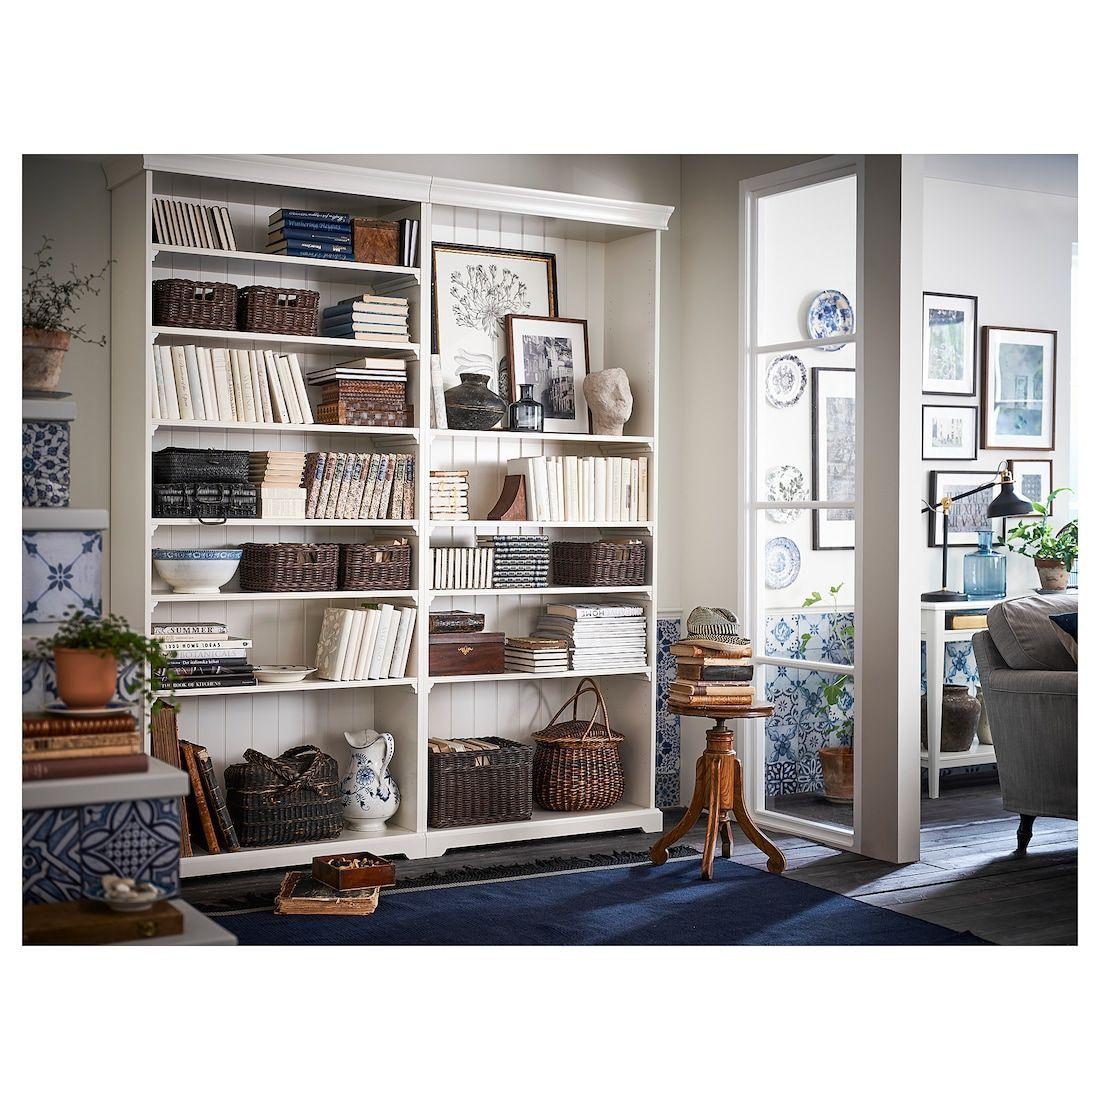 IKEA LIATORP White Bookcase Furniture layout, Liatorp